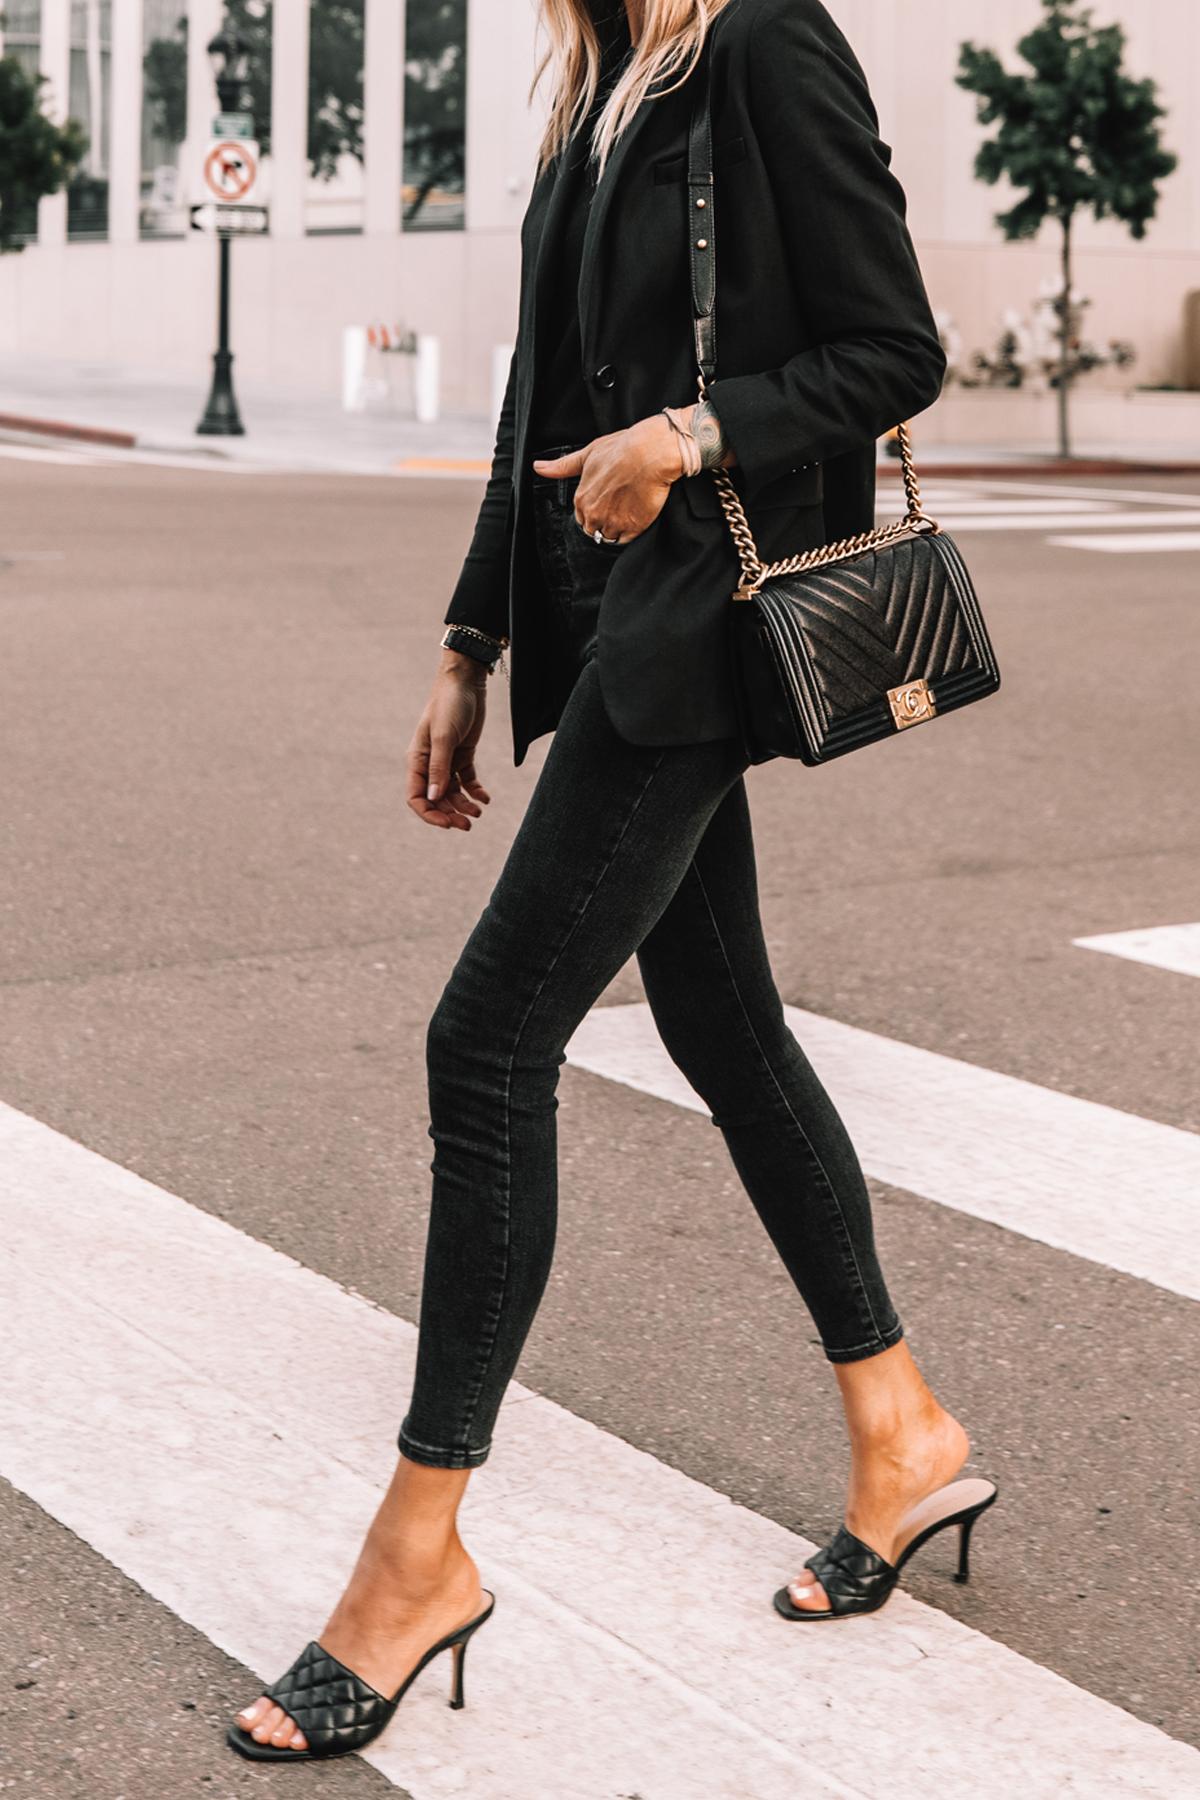 Fashion Jackson Wearing Everlane Black Blazer Everlane Black Skinny Jeans Black Heeled Sandals